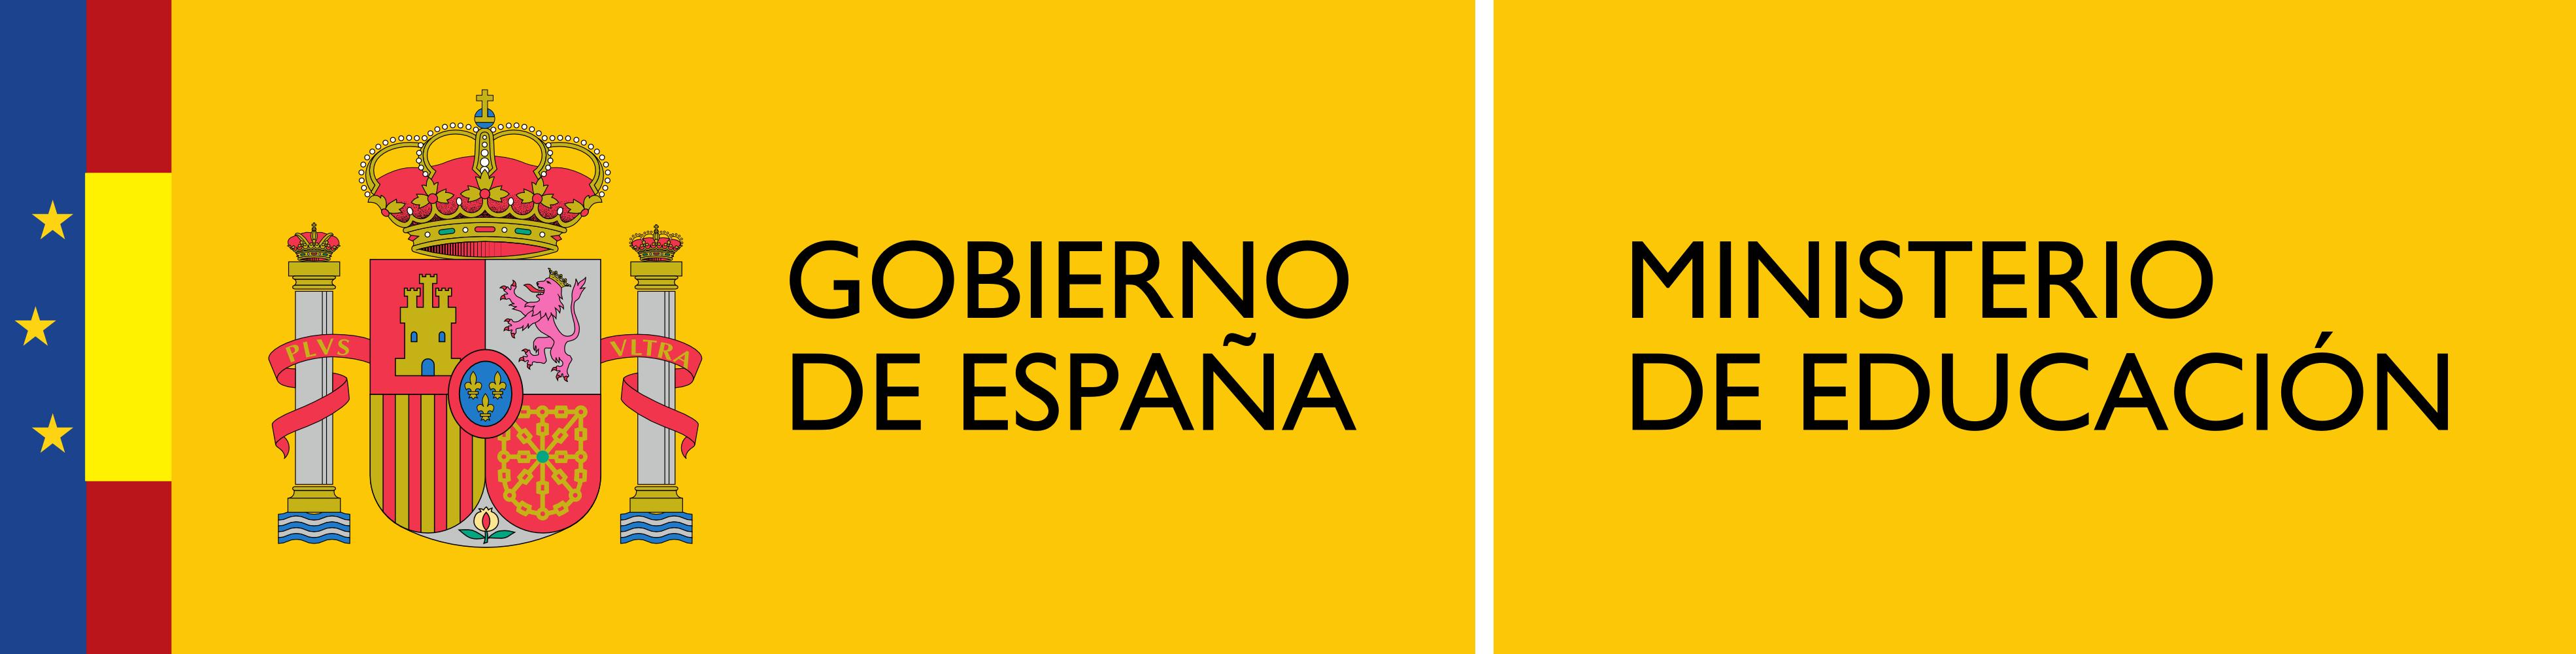 Logo Del Ministerio De Educacion